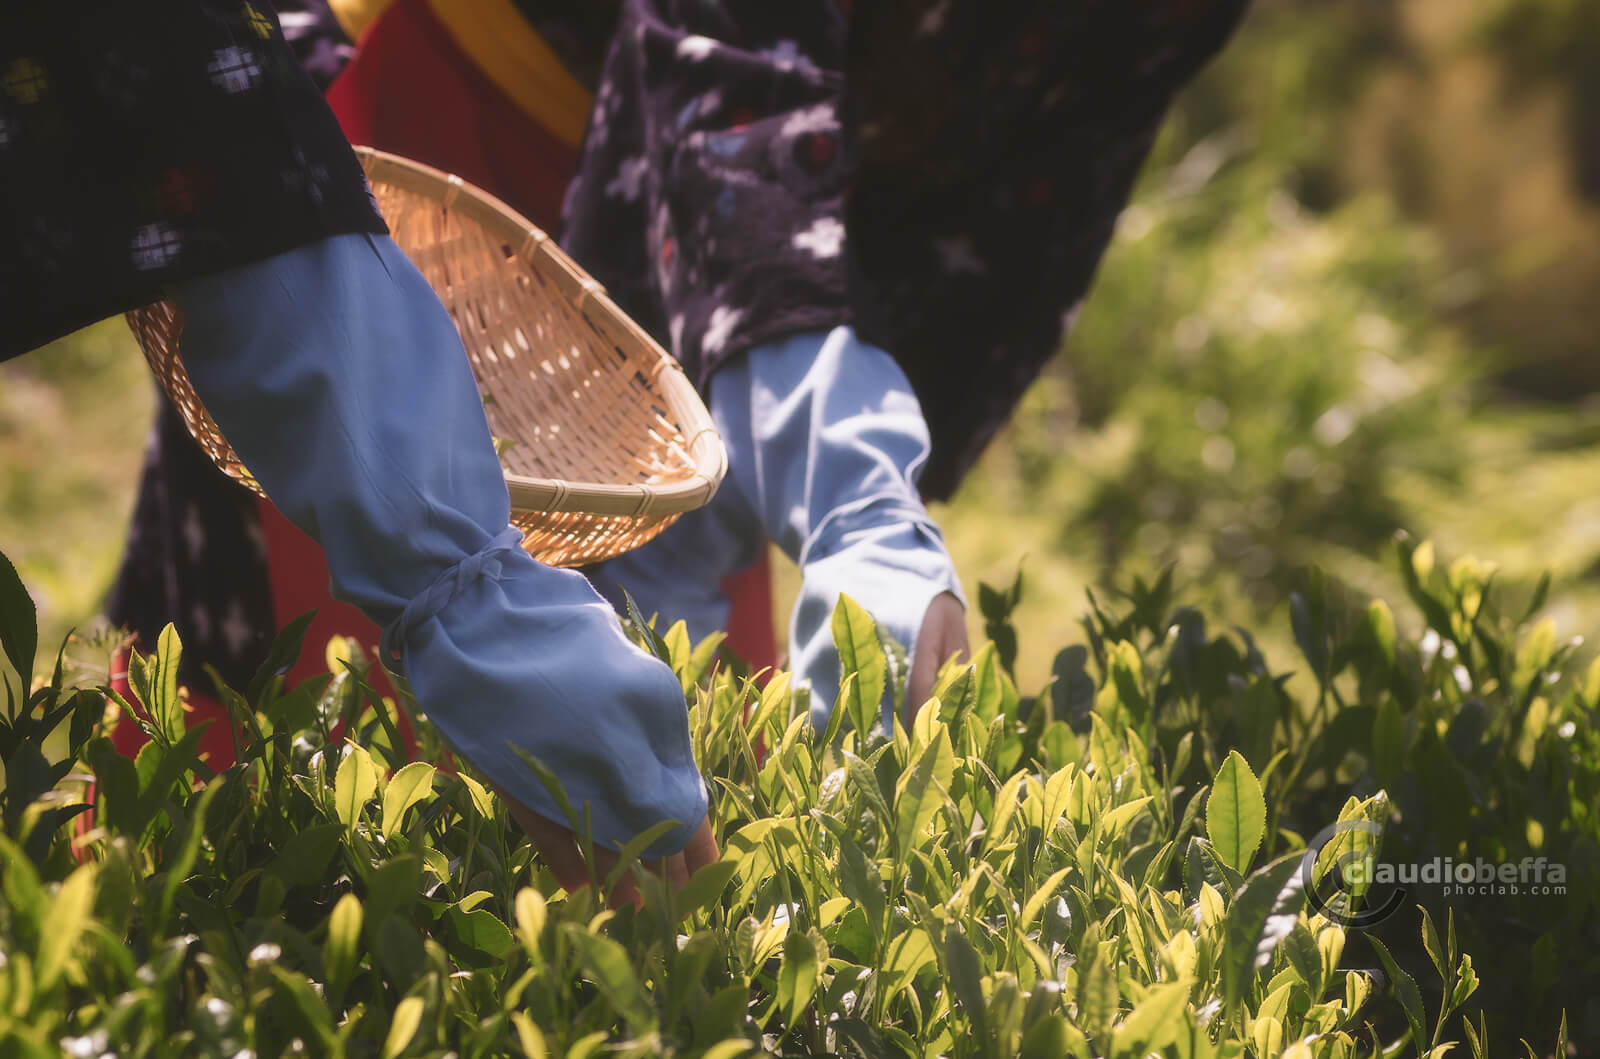 Japanese traditional method of picking tea leaves, Japan, Tradition, Travel.